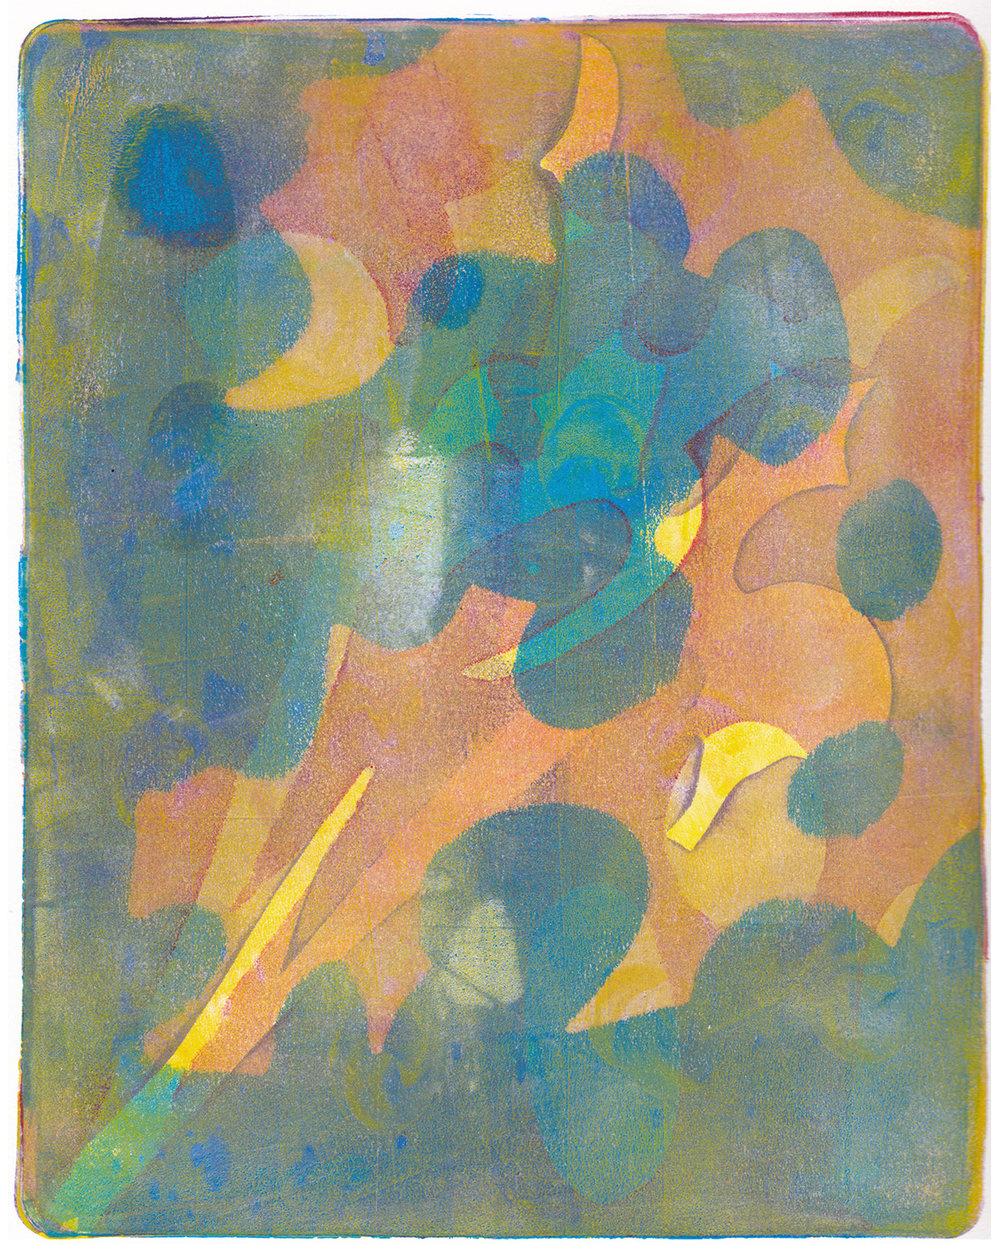 Monica DeSalvo,  Sun Shadow , Gelatin monoprint with acrylic, 12x16, $450